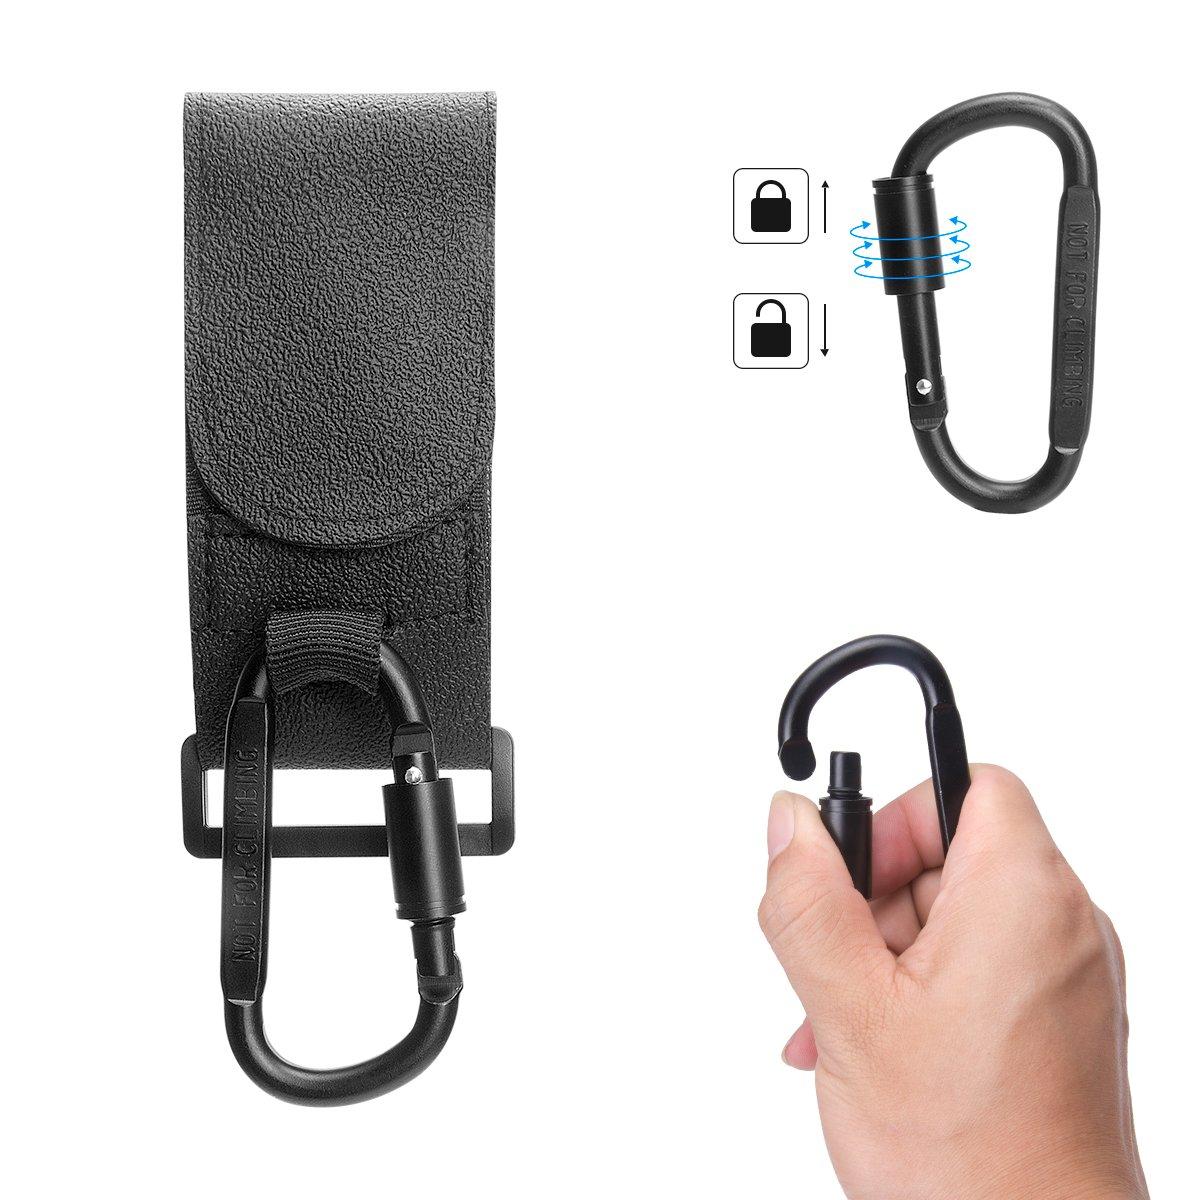 Stroller Hook Set, Pack of Handy Pram Hook Buggy Hanger Clip + Stroller Net Bag for Baby Diaper Bags Groceries Clothing Purse Stroller Accessories Kit Hangs for Jogging Walking/Shopping by fantaseal (Image #4)